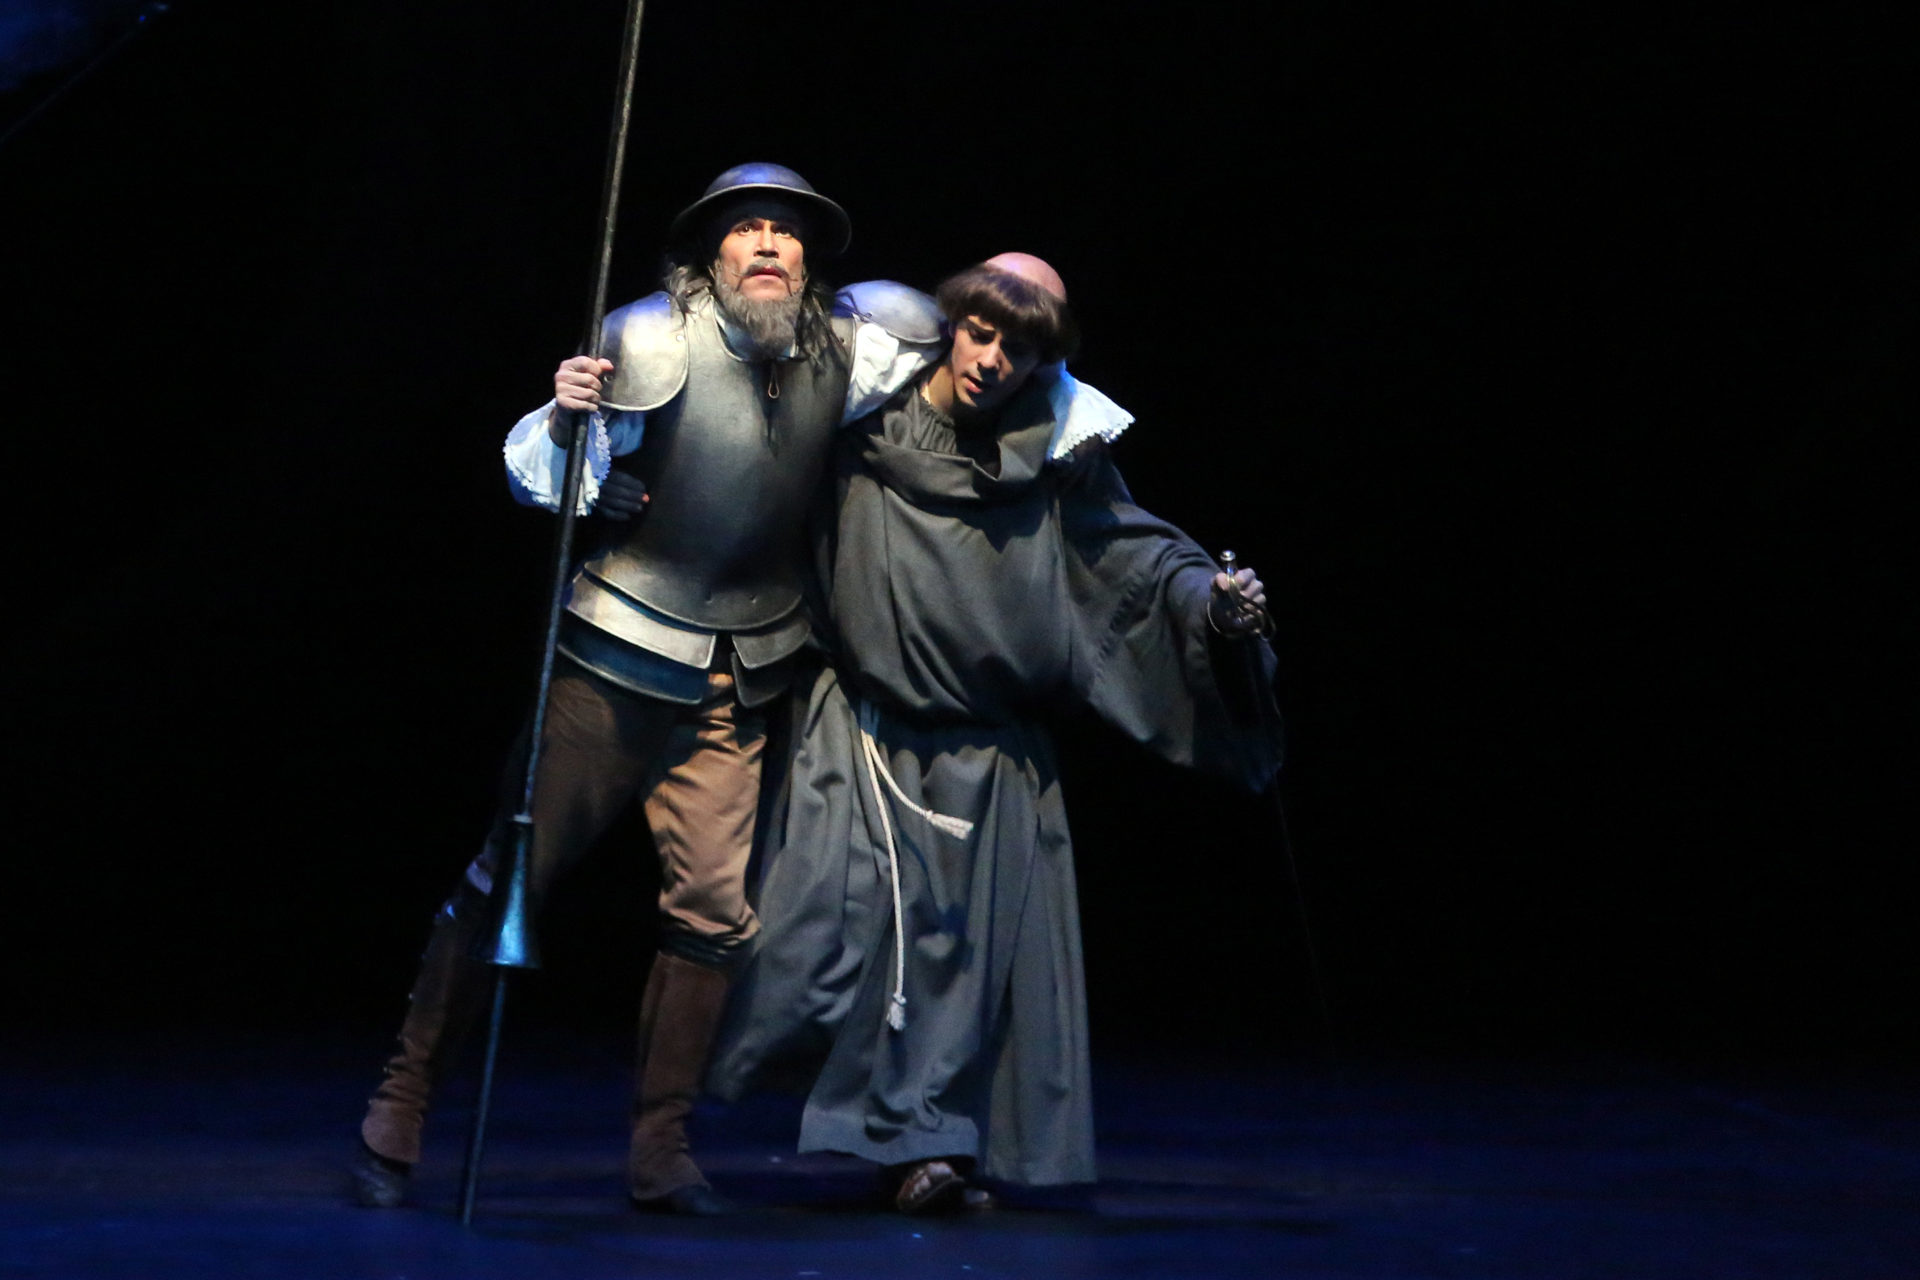 Don_Quixote_HH_Ballett_Foto_AnjaBeutler.de_390